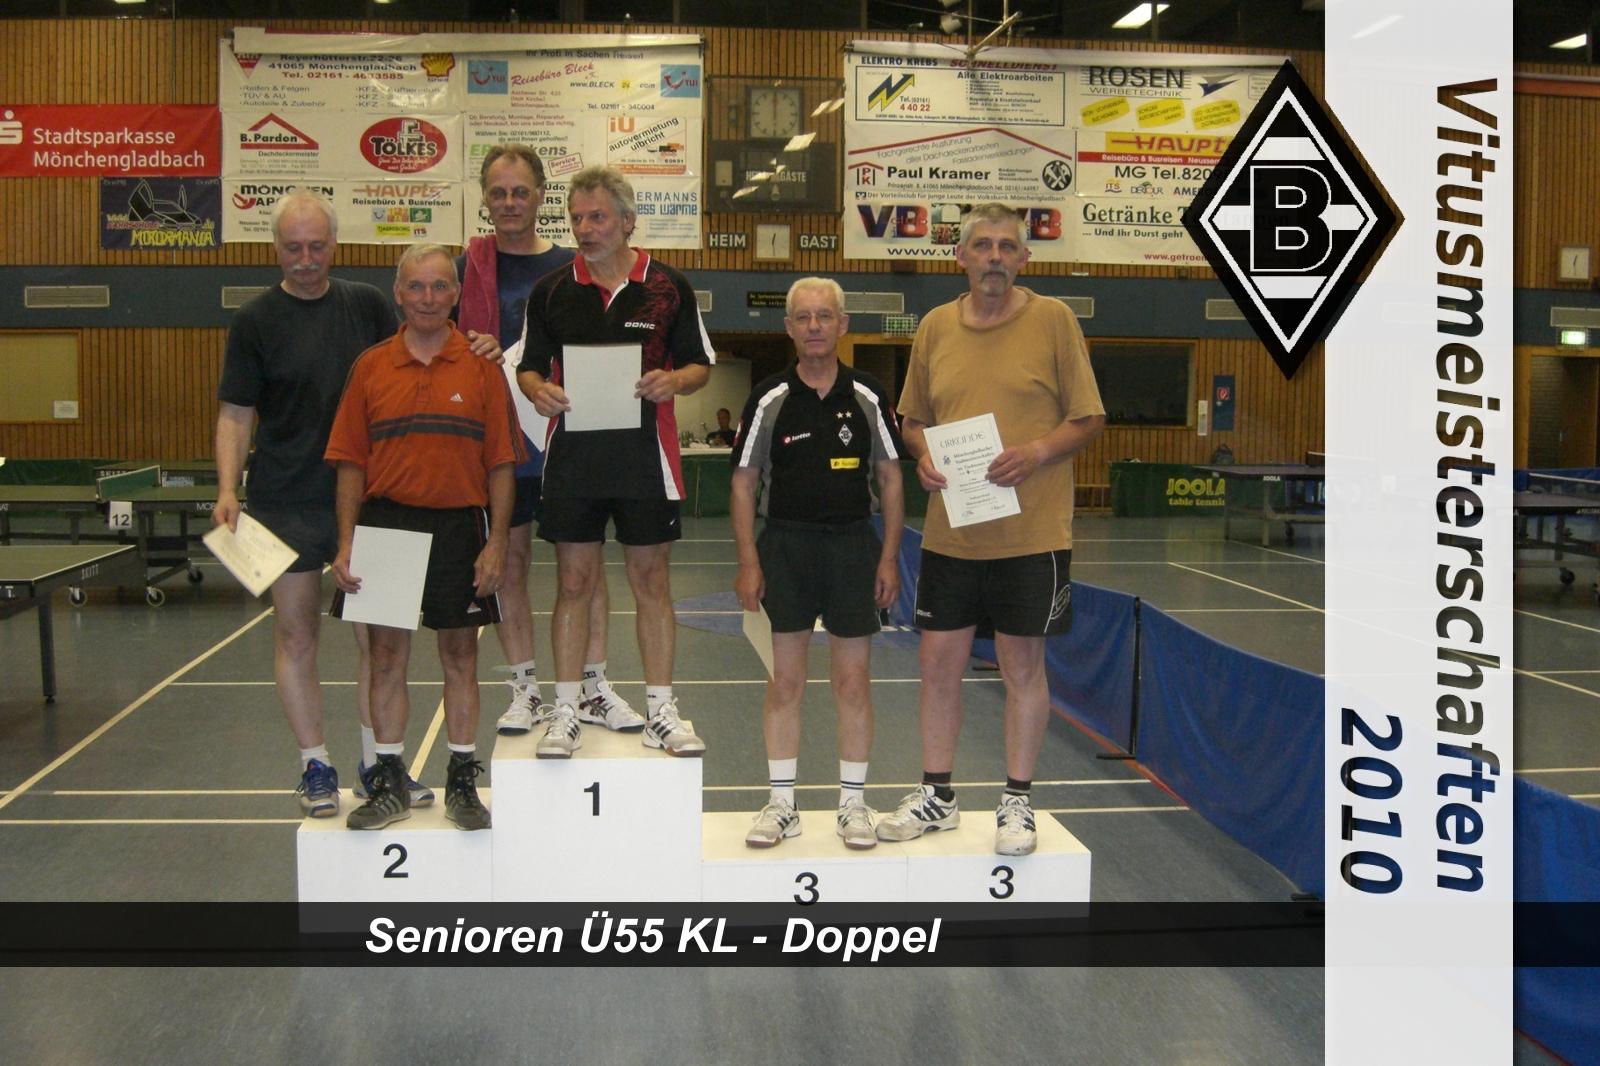 SeniorenU55KL Doppel